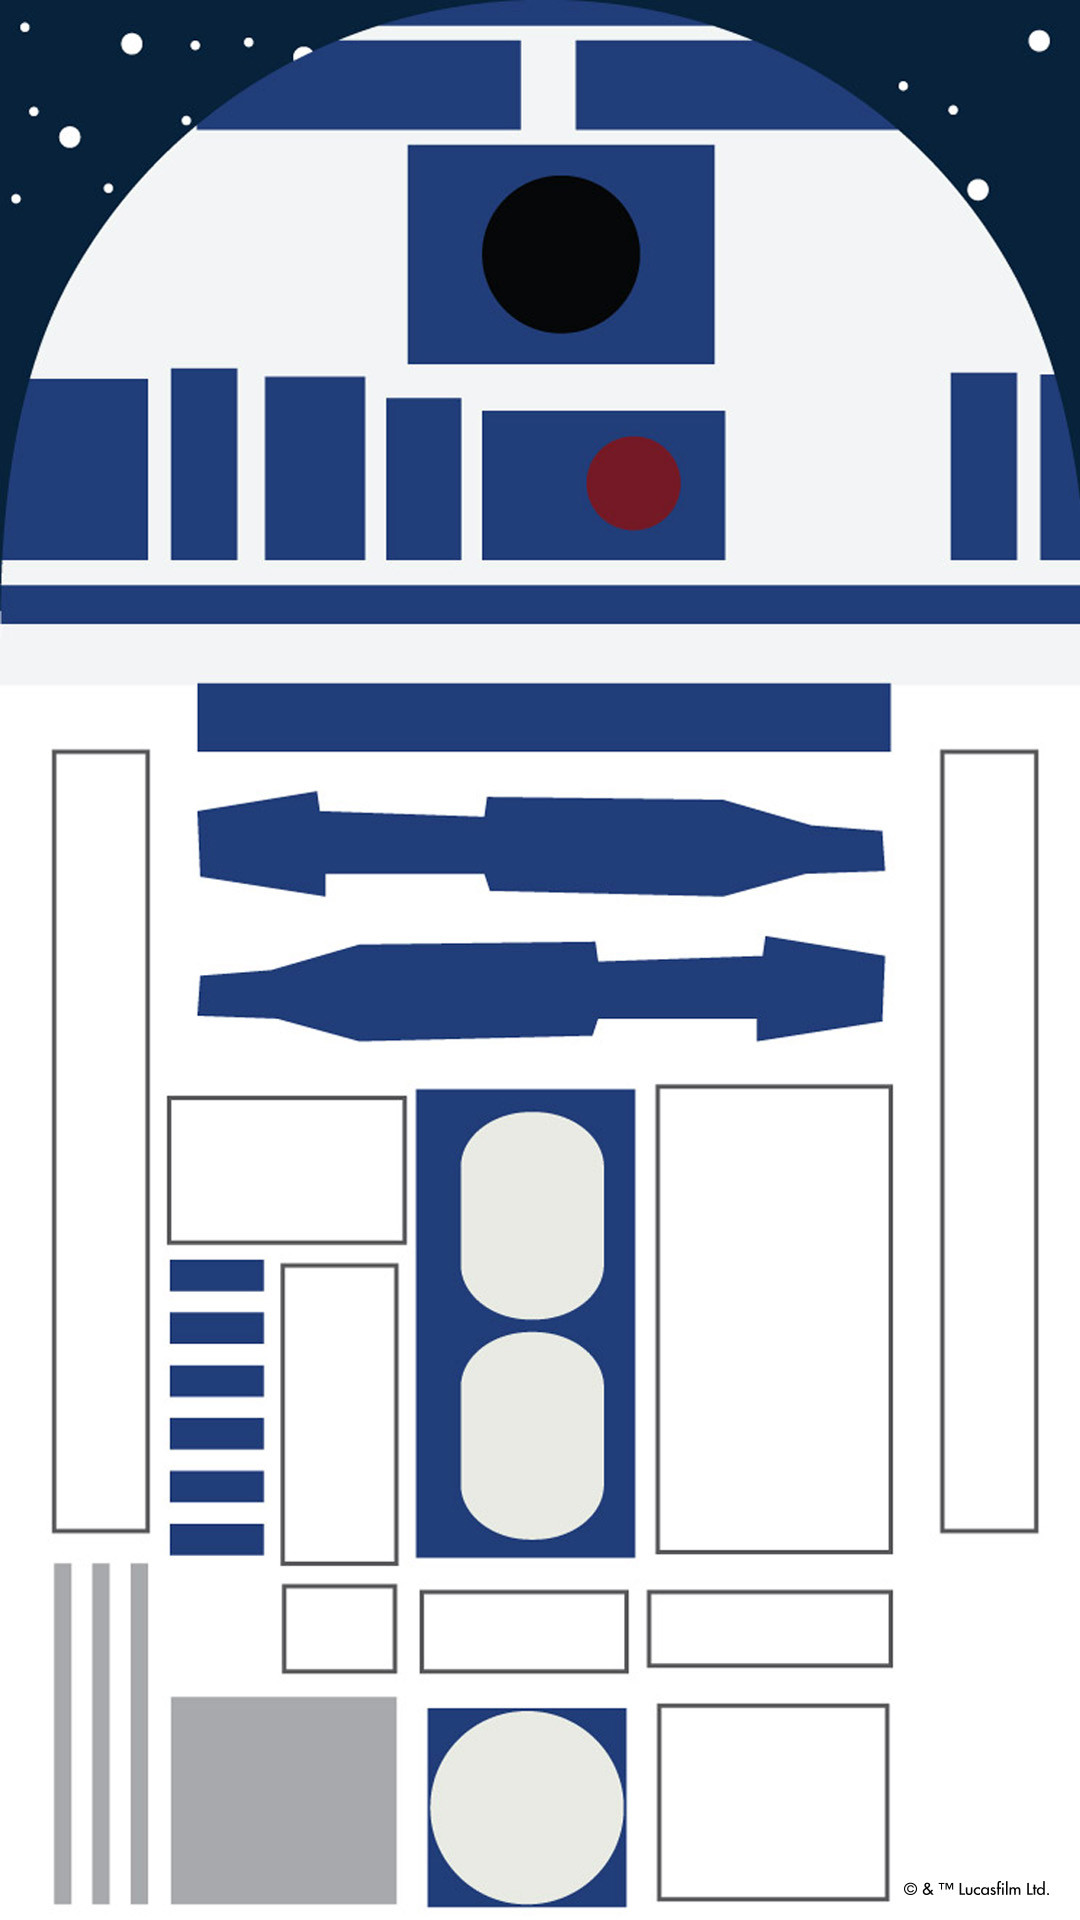 R2 D2 Star Wars Iphone Wallpaper